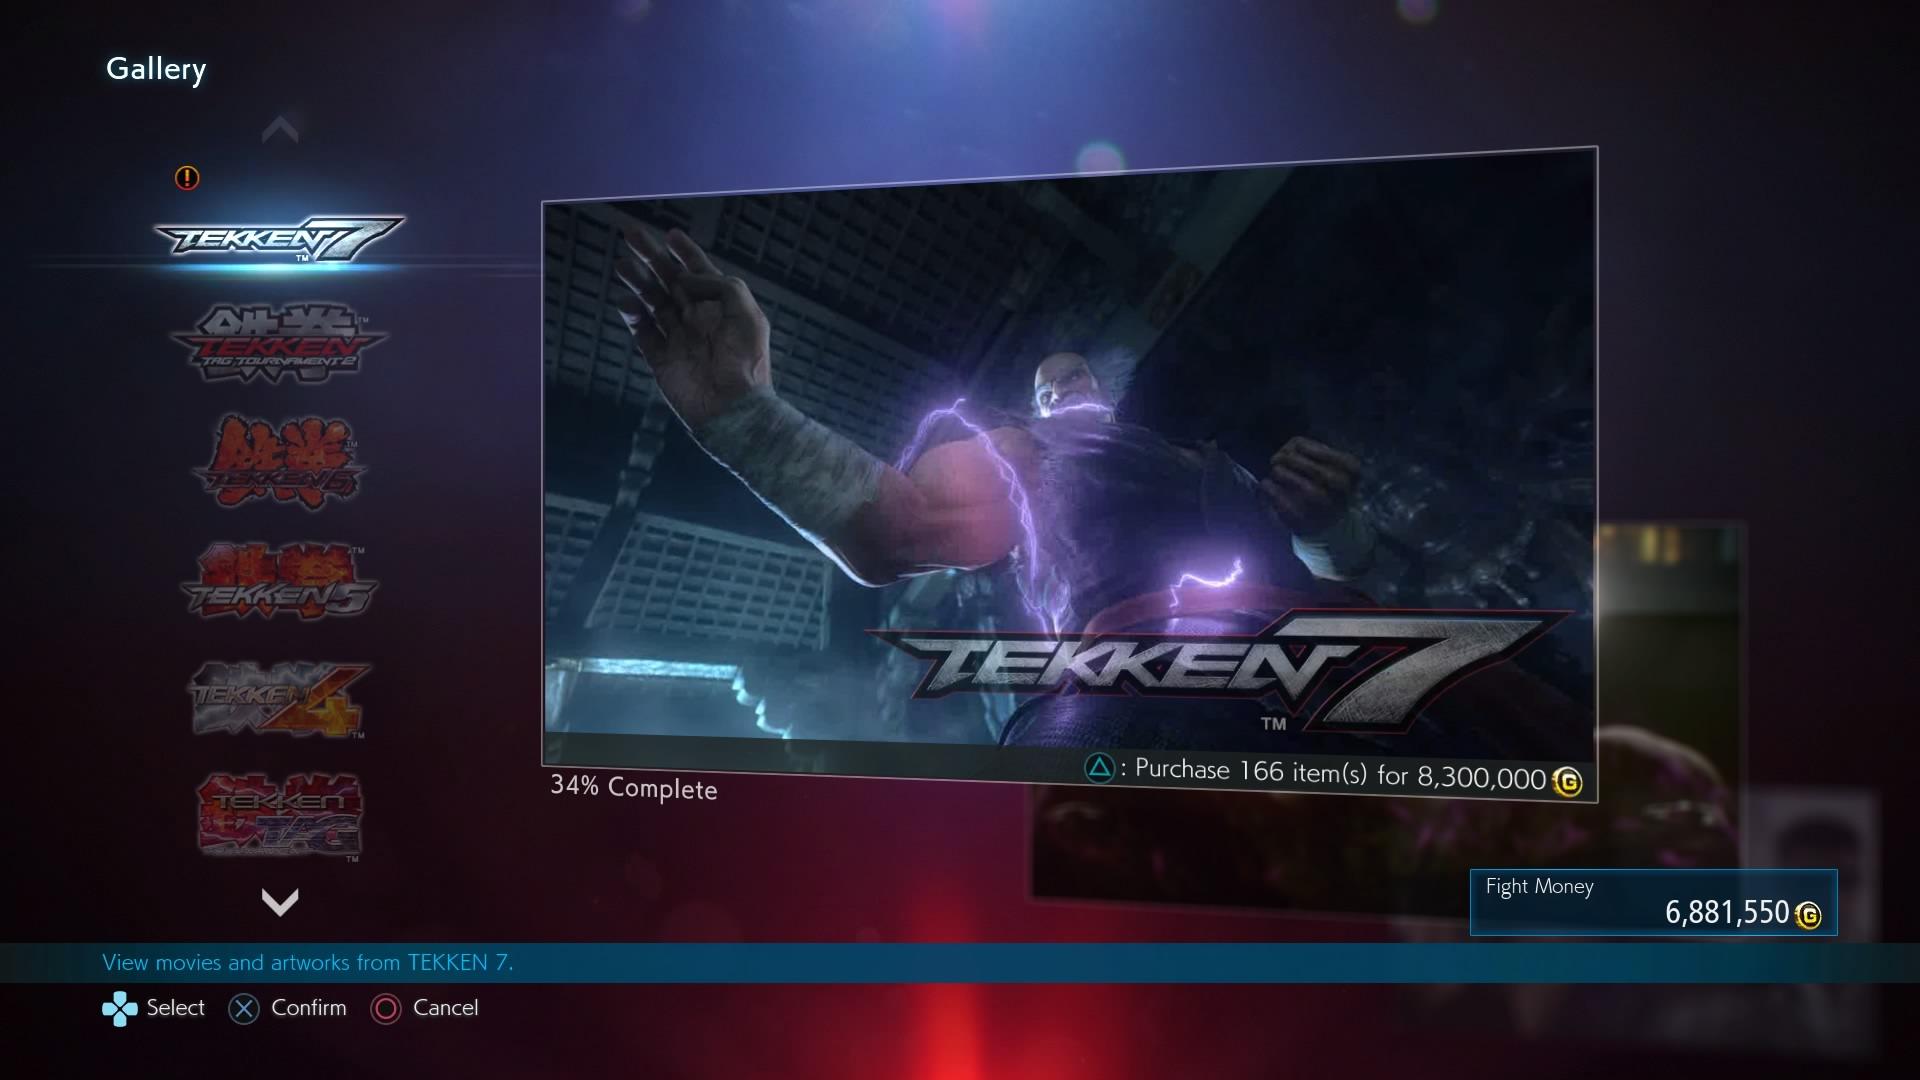 Tekken 7 (Playstation 4) Review in Progress - Otaku Gamers UK